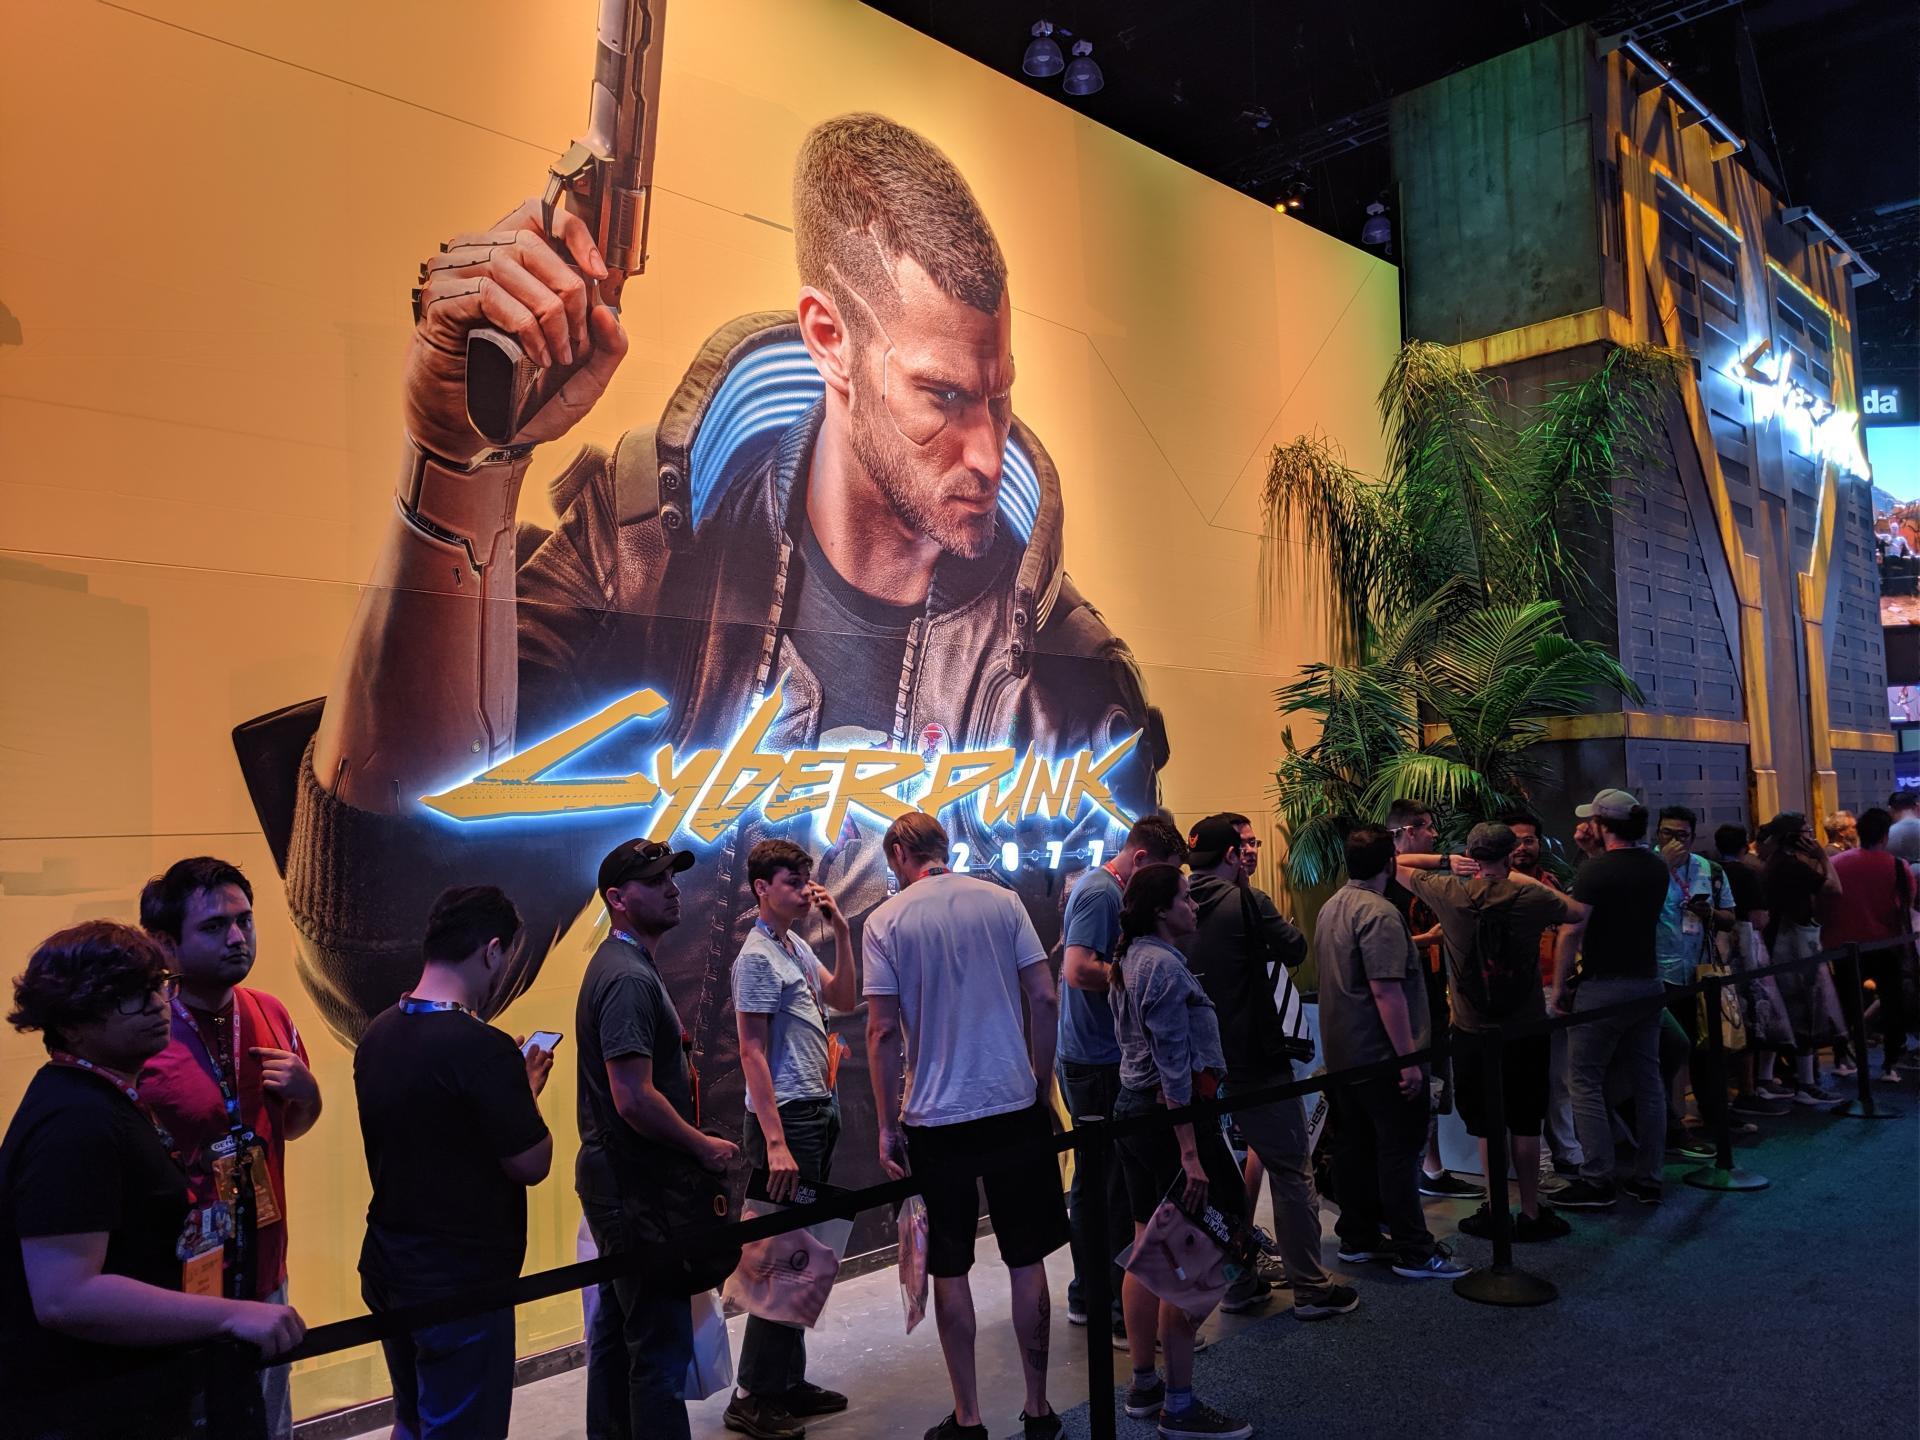 Le stand« Cyberpunk 2077» au Salon du jeu vidéo E3 2019.